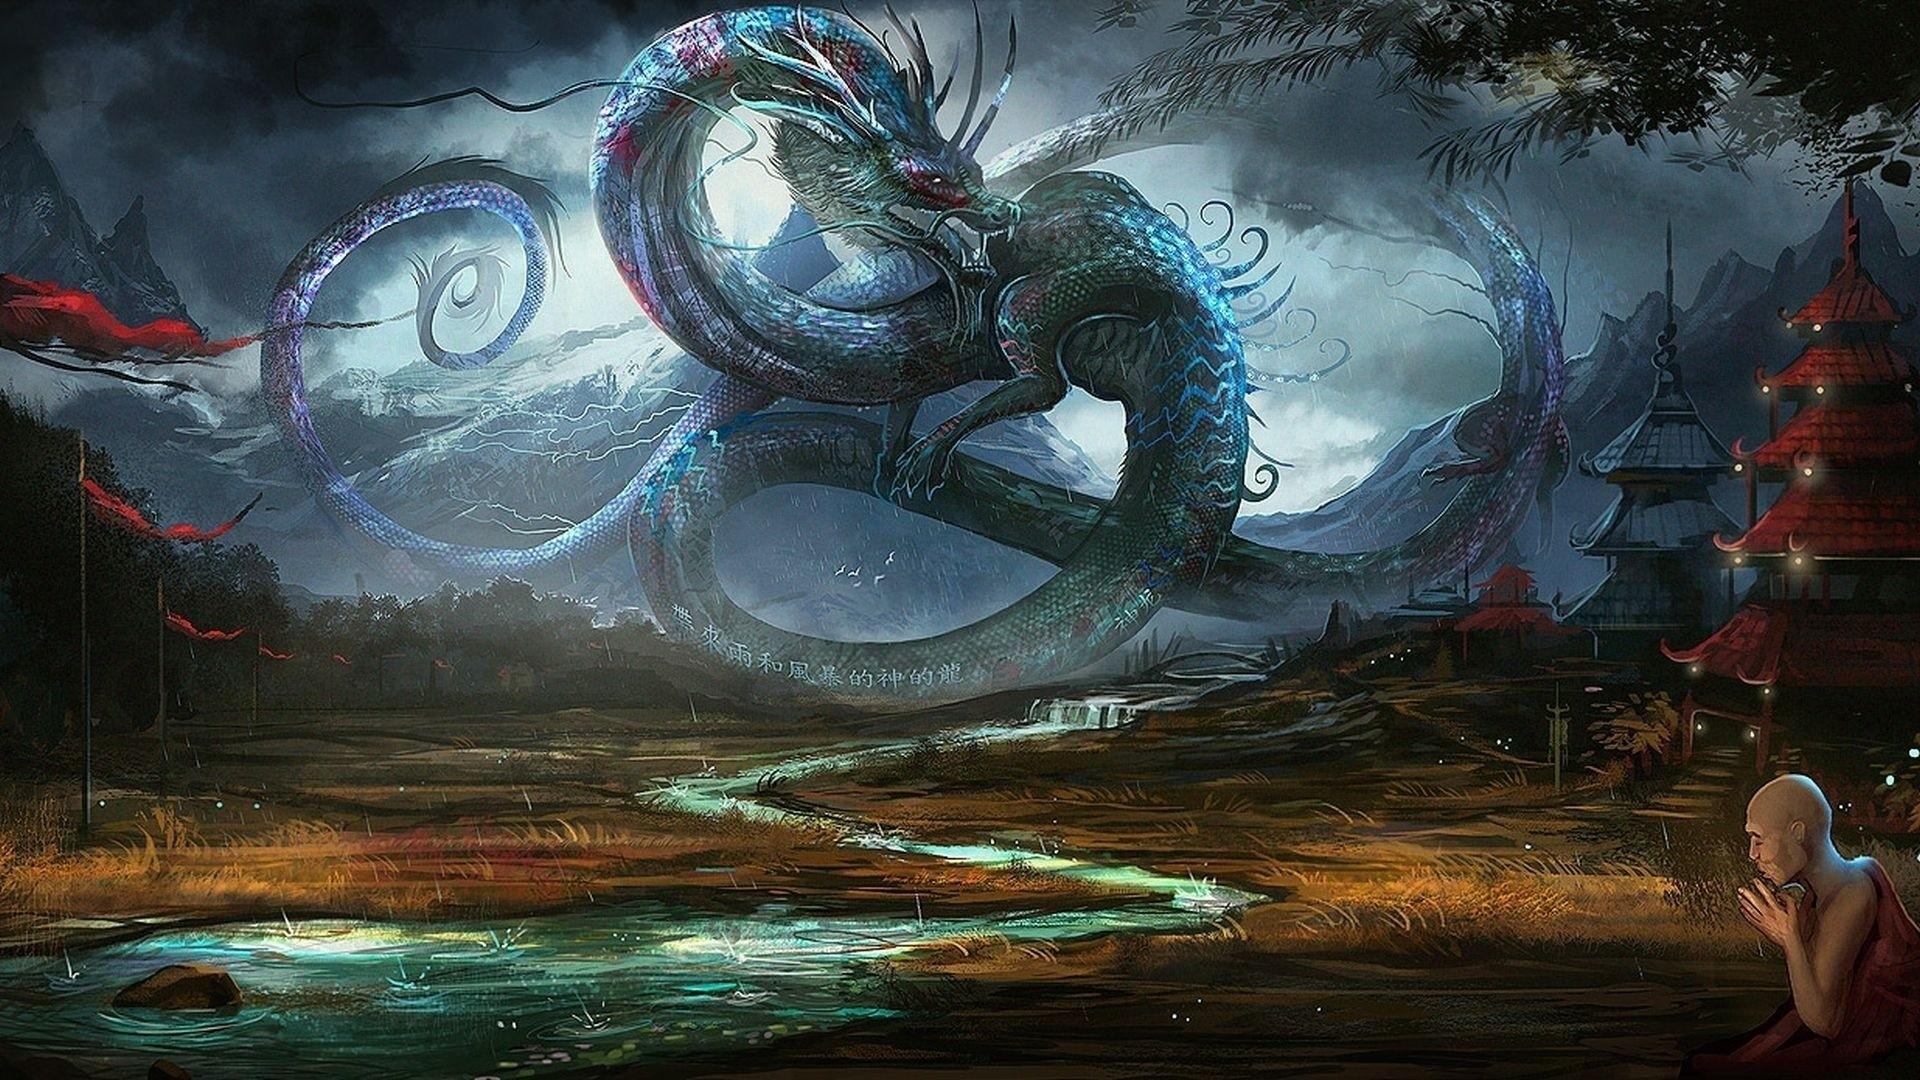 Fantasy Dragons Images Wallpaper   Full HD Wallpapers .